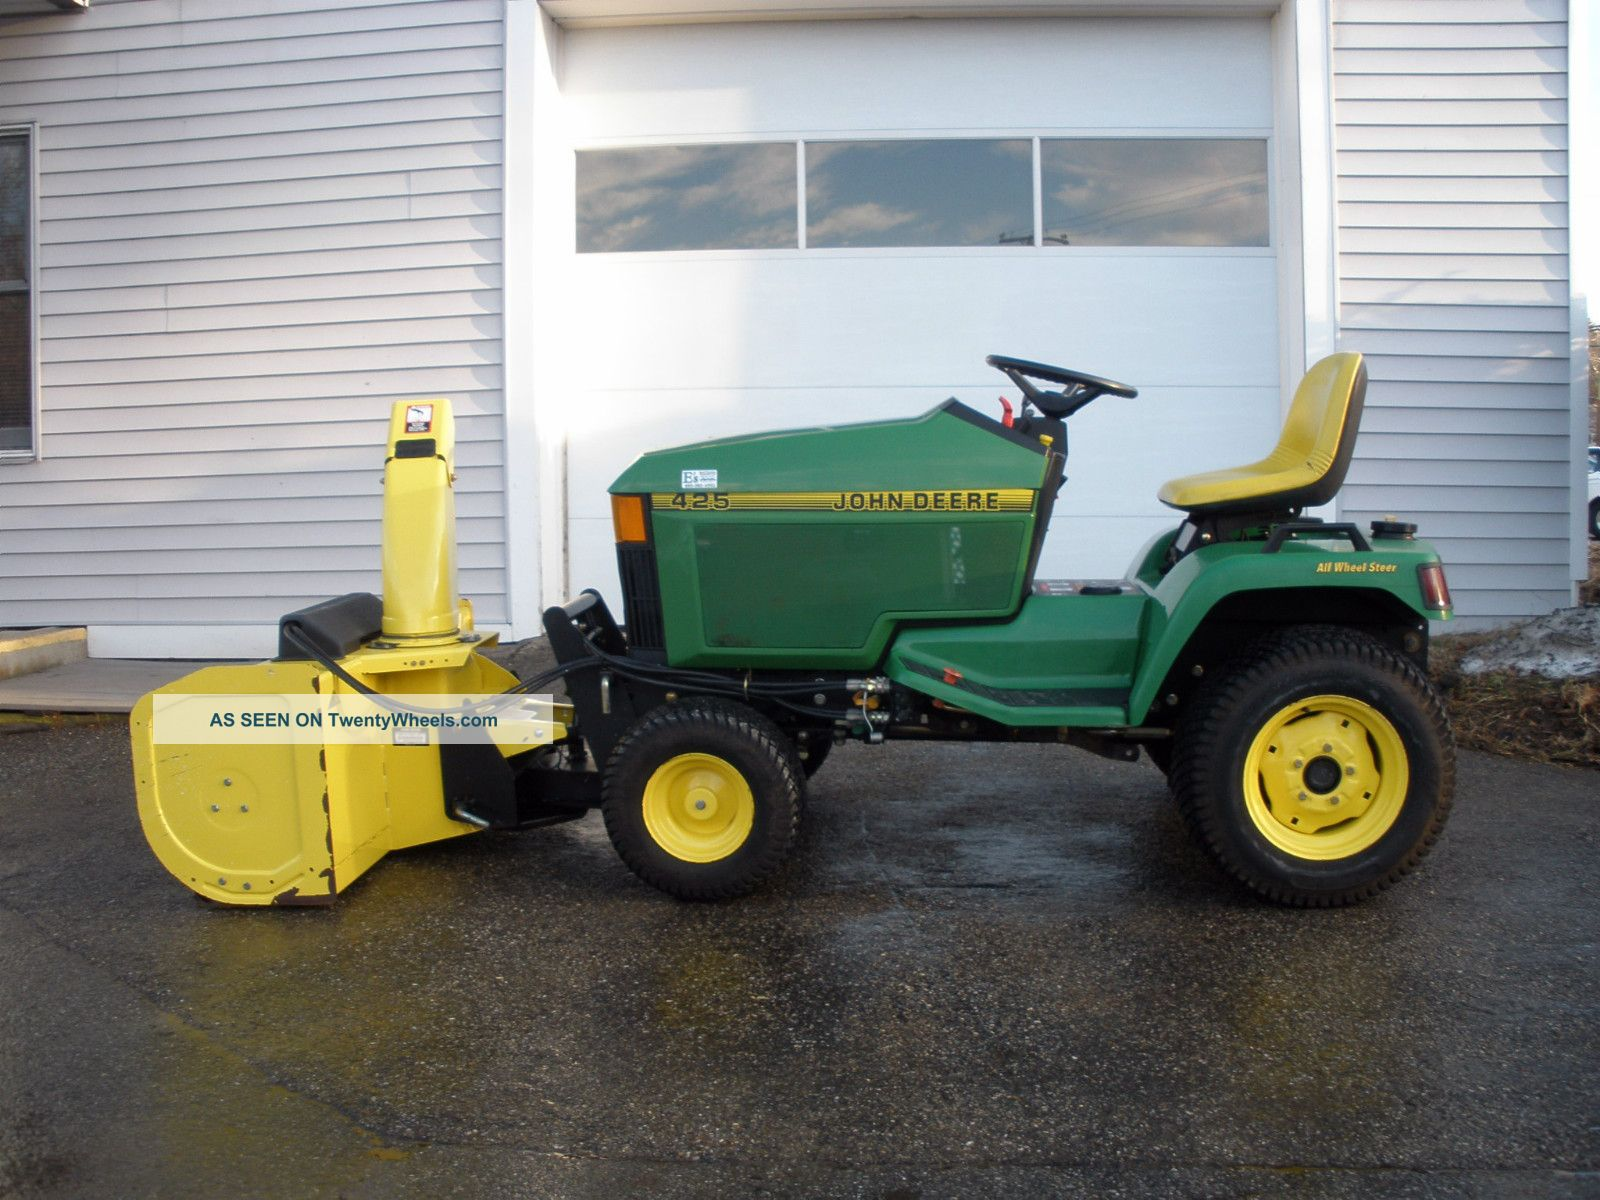 John Deere 425 All Wheel Steer Tractor W/ Snow Blo